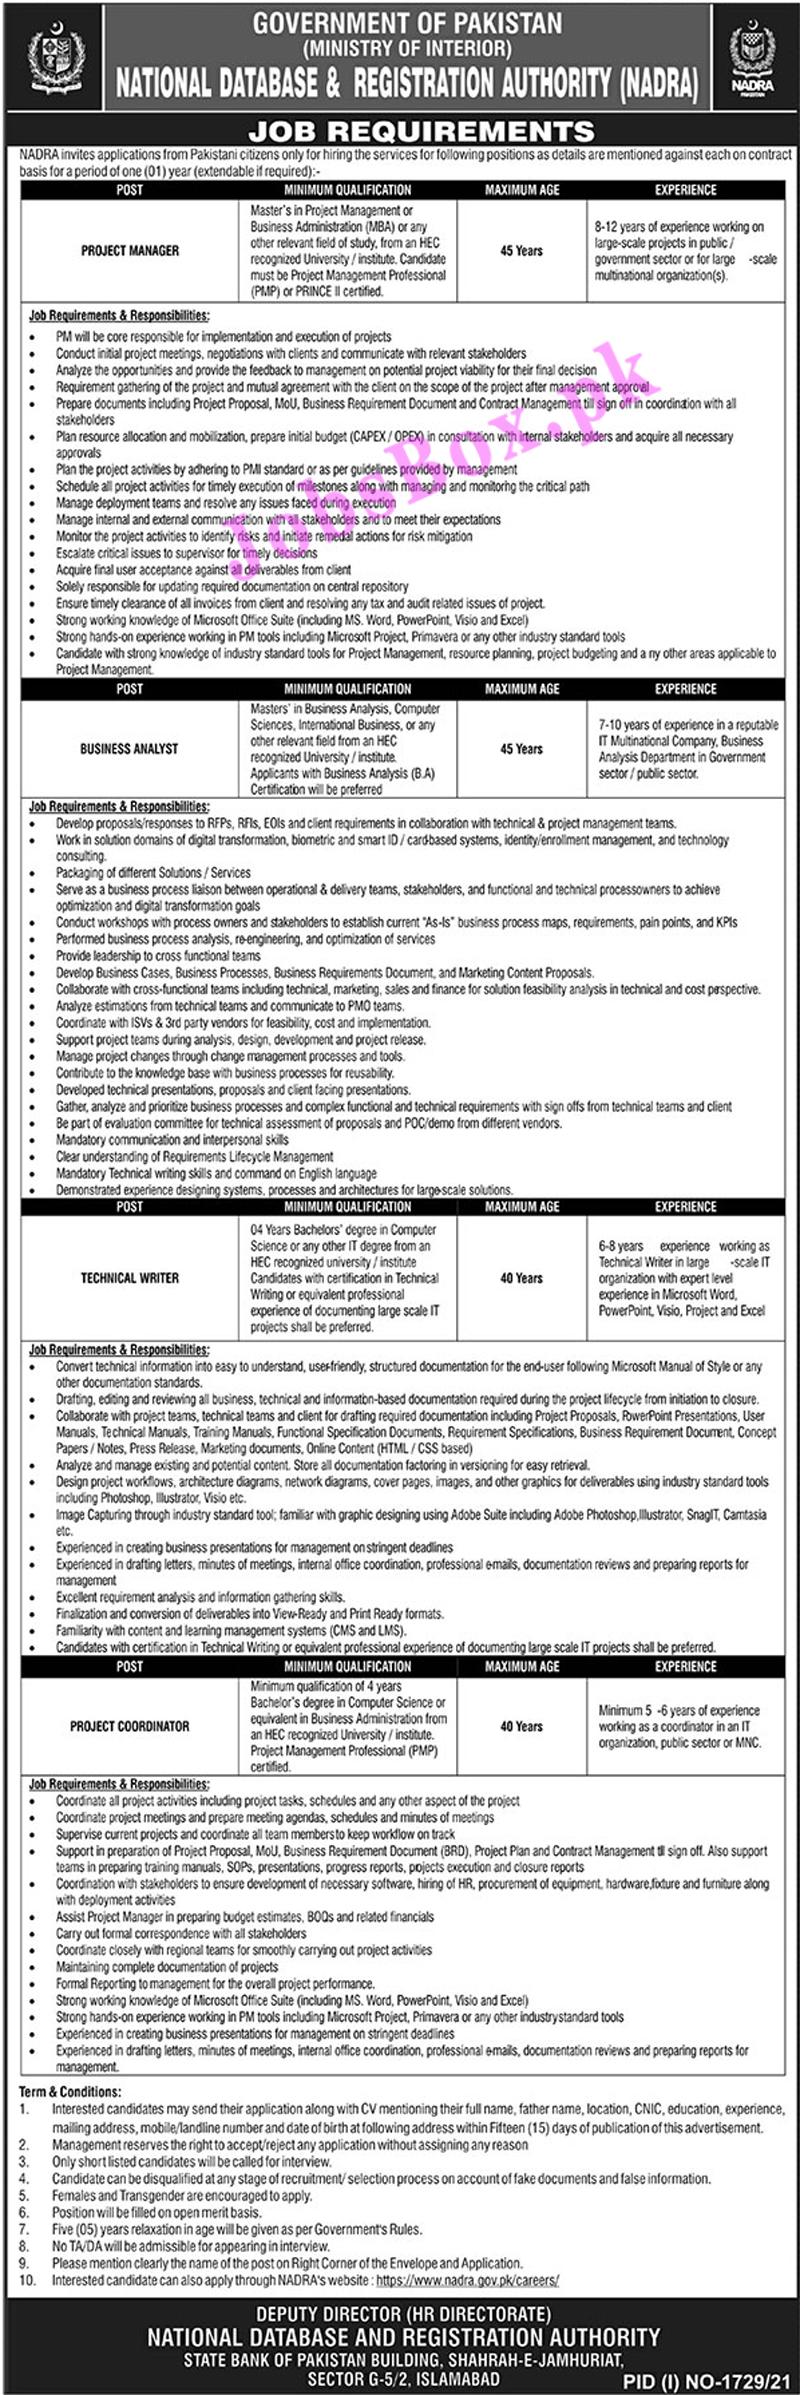 Ministry of Interior NADRA Islamabad Jobs 2021